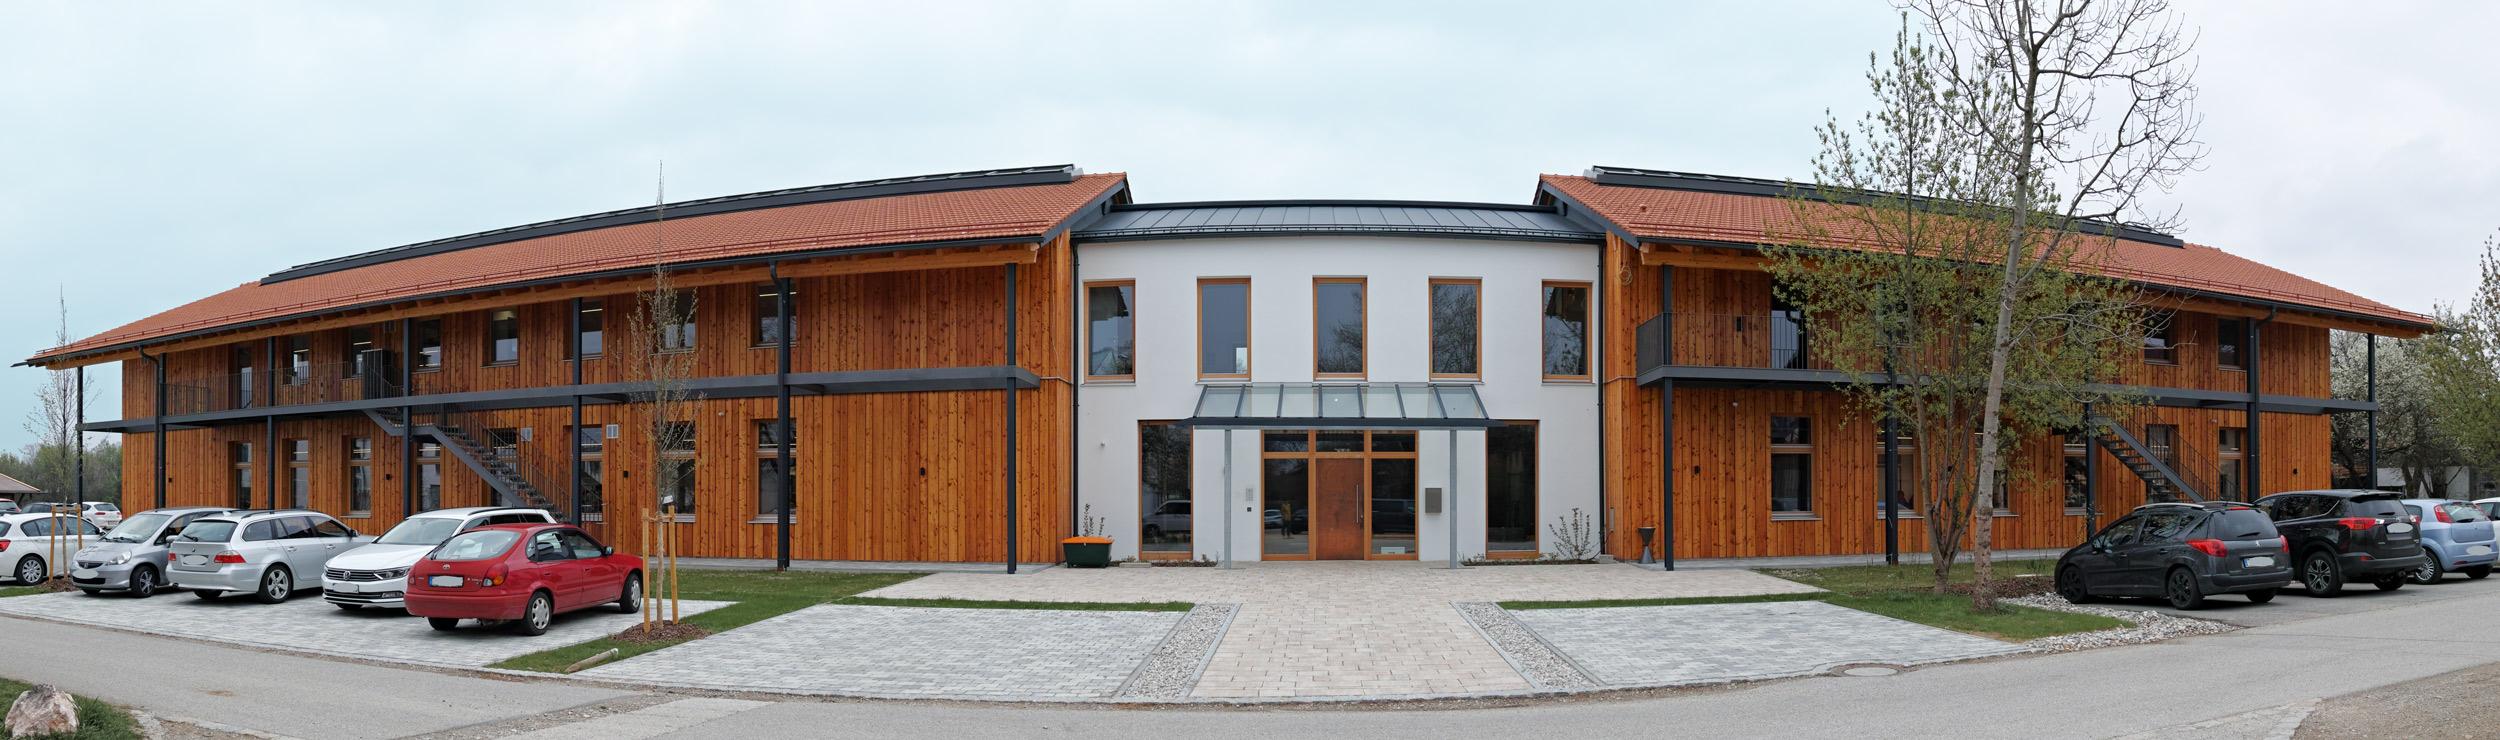 Headquarter Hartlauer Präzisions Elektronik GmbH in Uebersee am Chiemsee/Germany